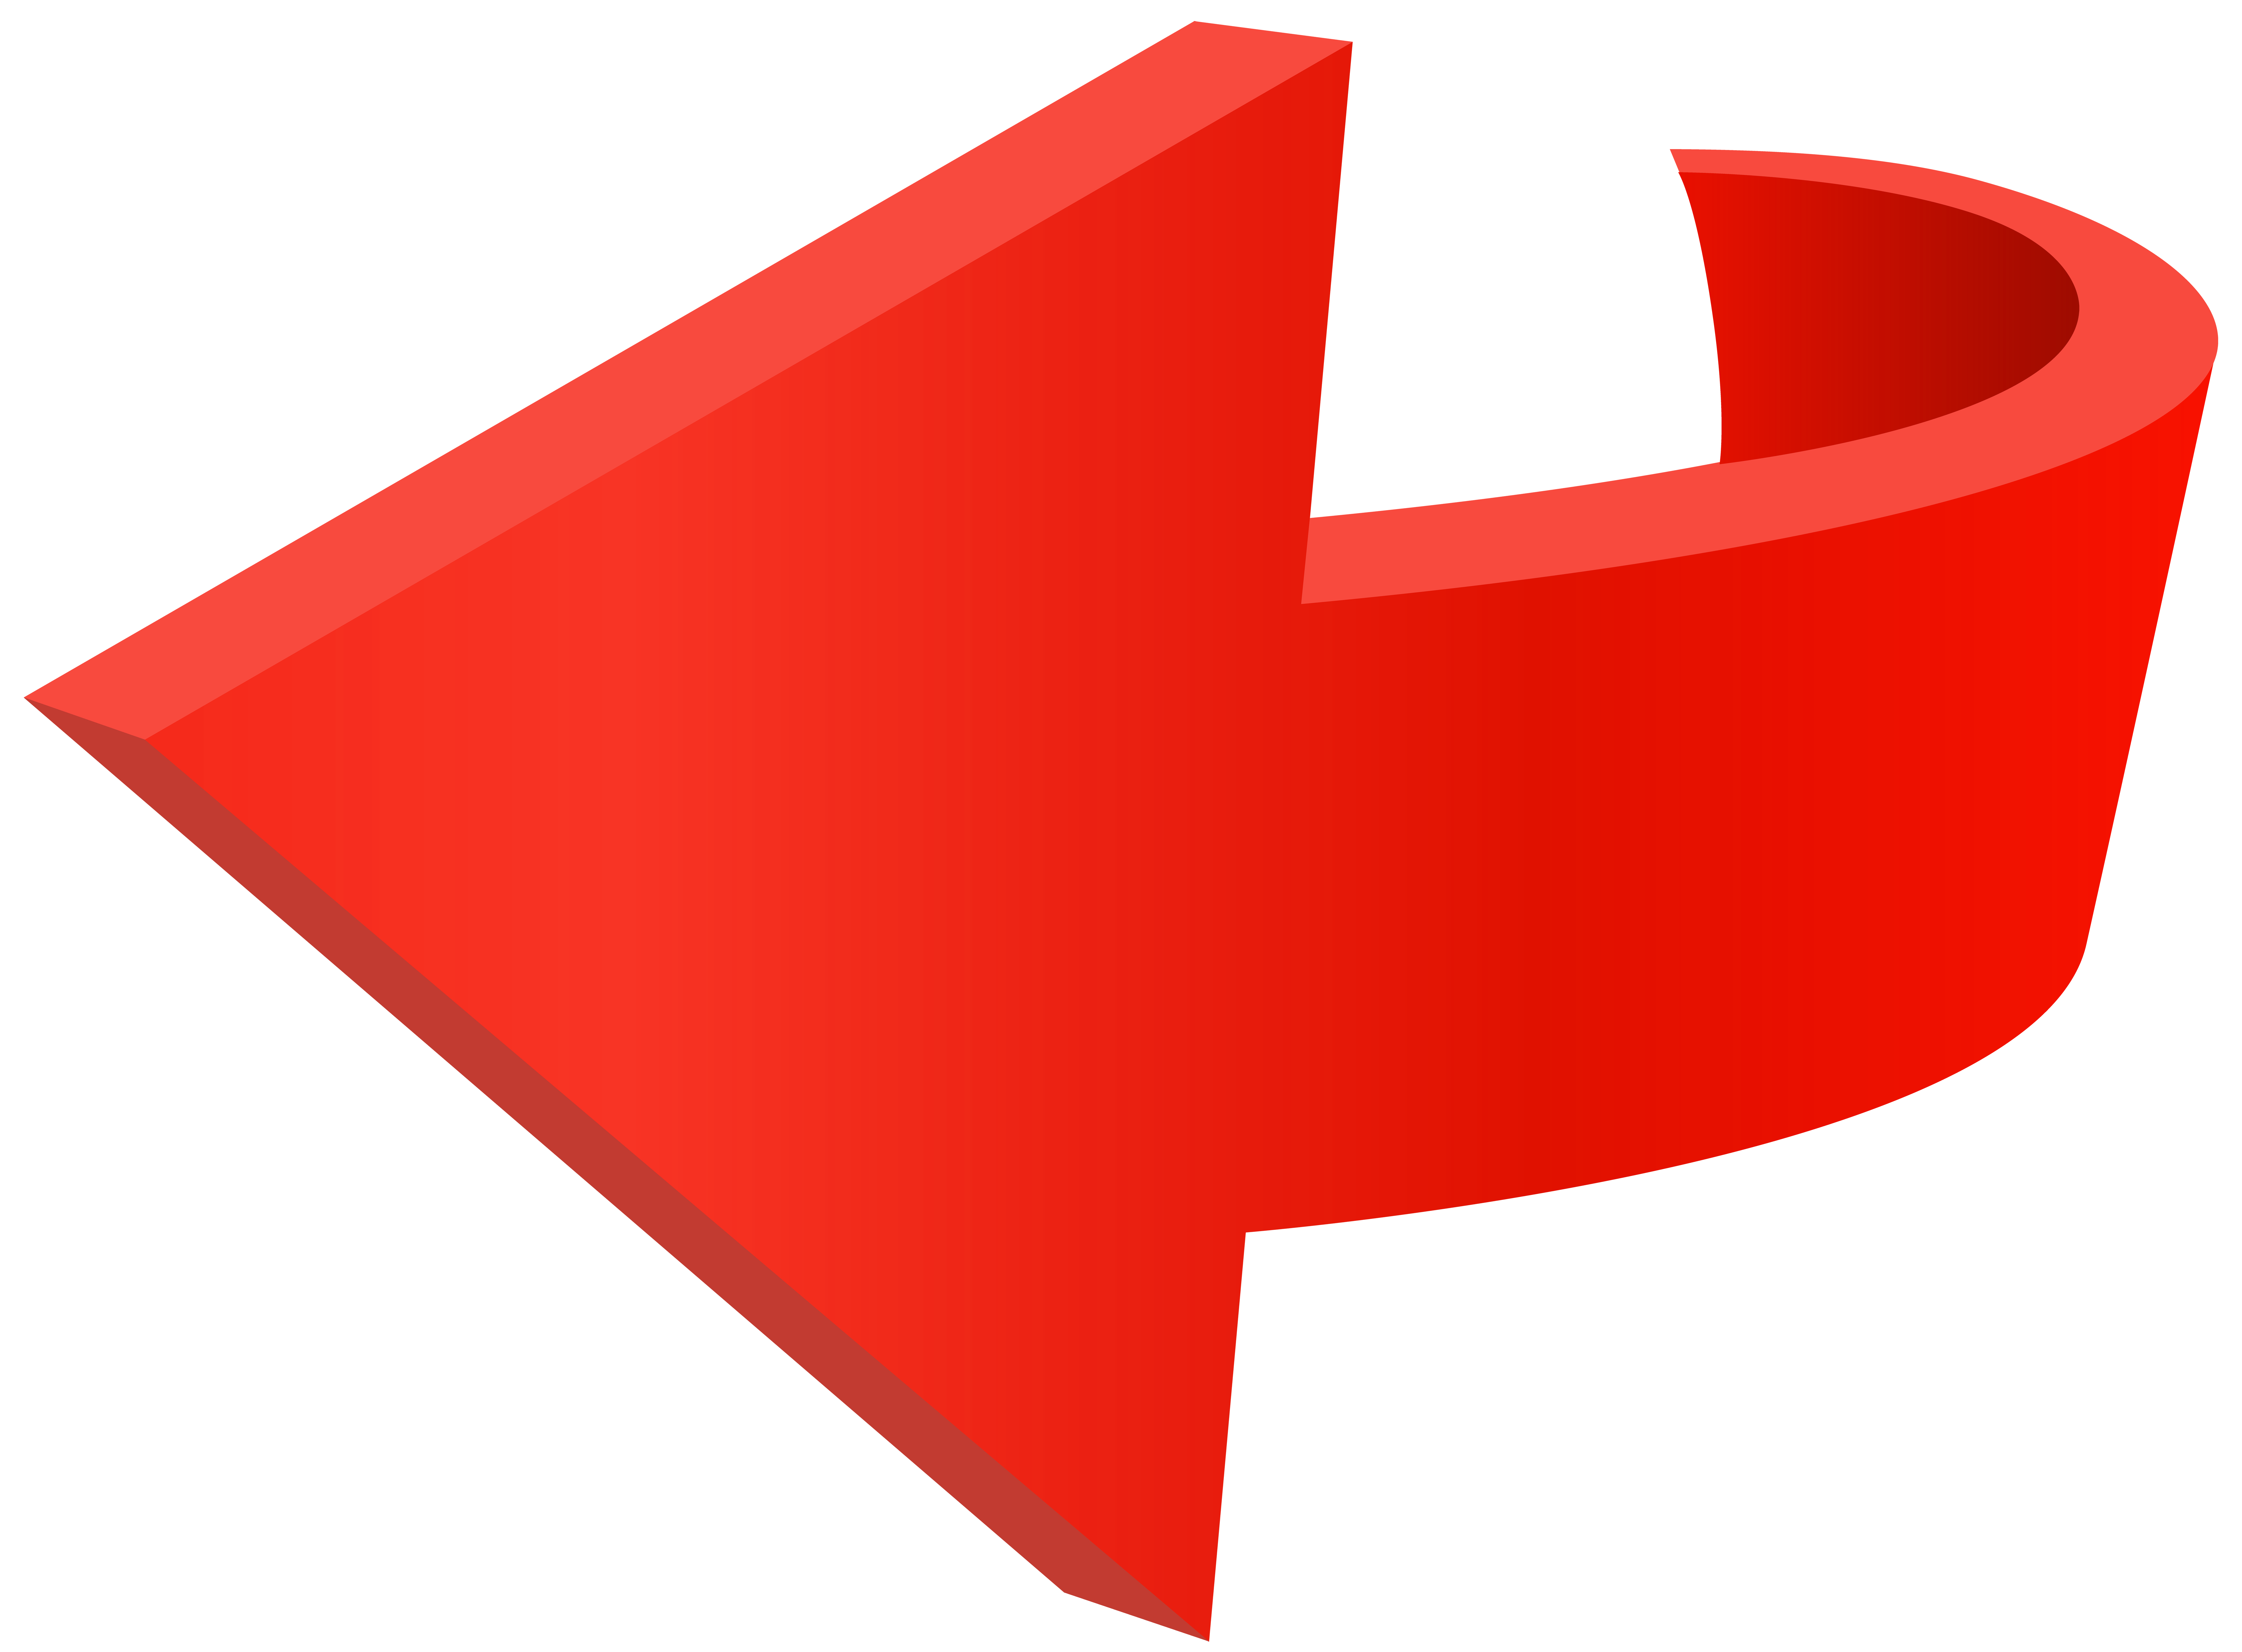 Left Red Arrow Transparent PNG Clip Art Image.